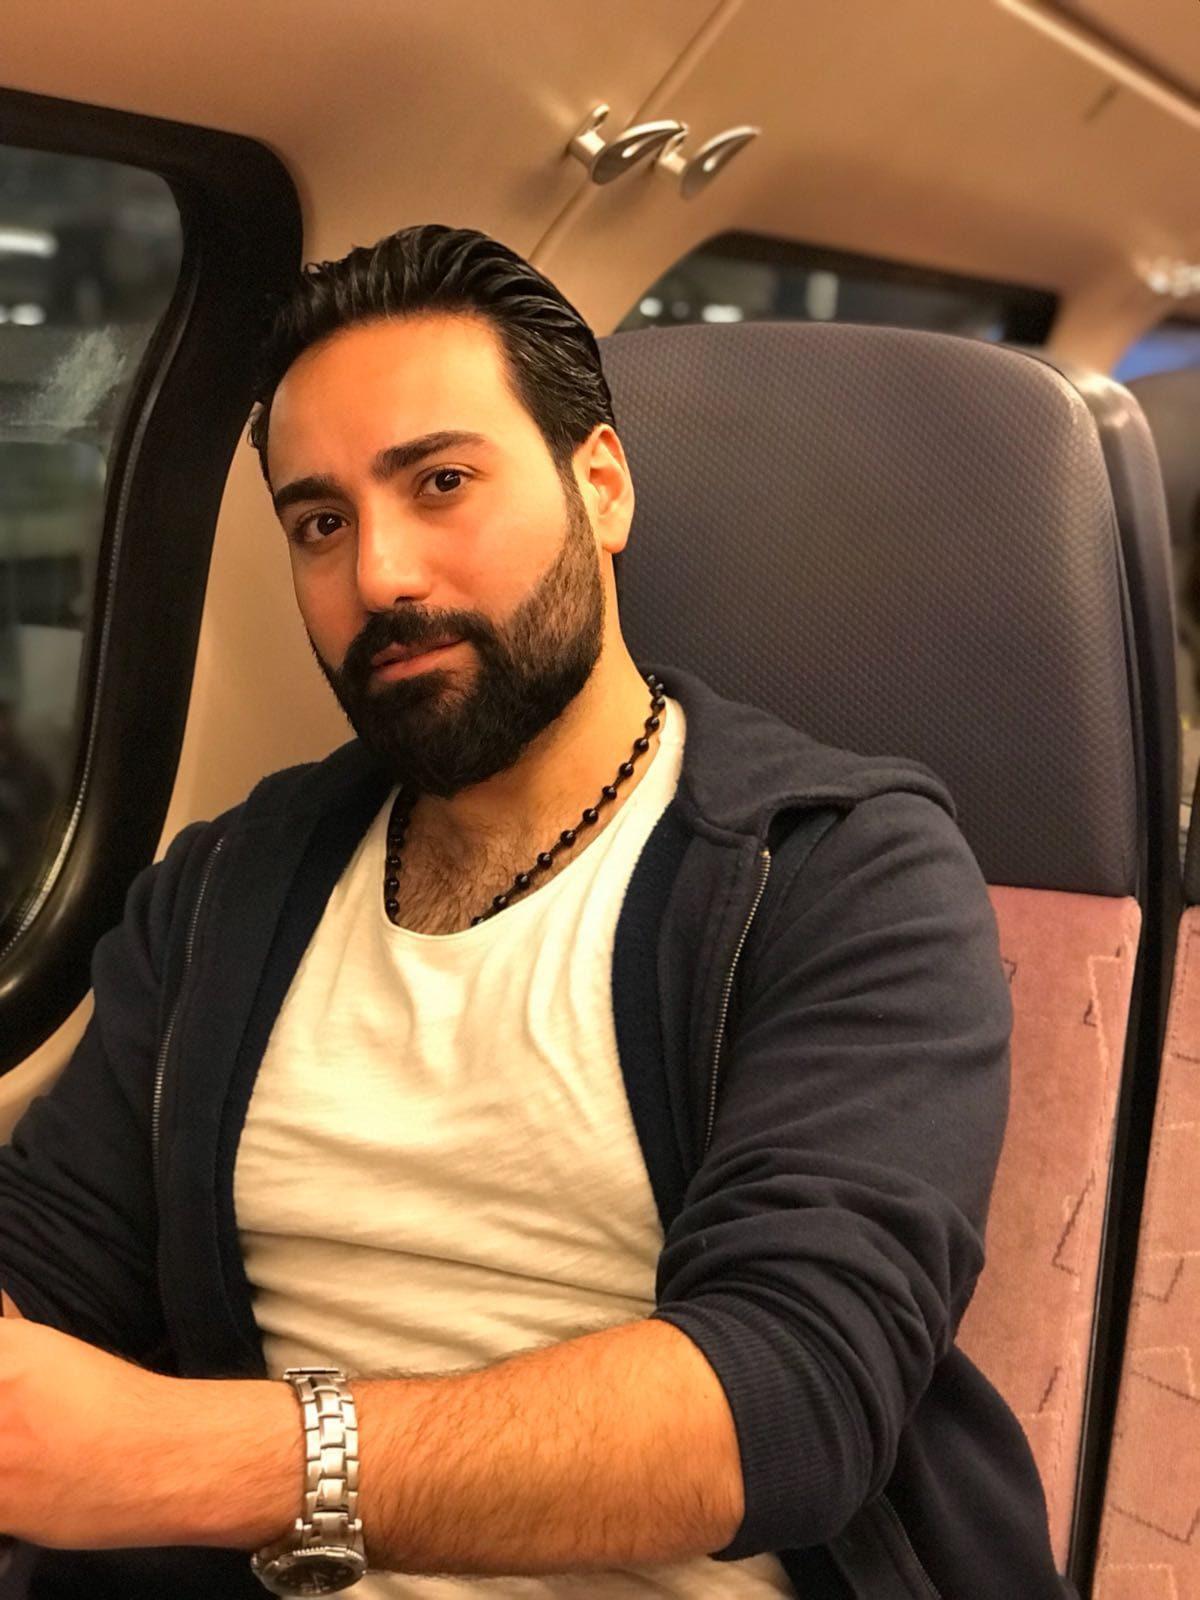 Dating Syrische man 14 jaar oude Lesbische dating site